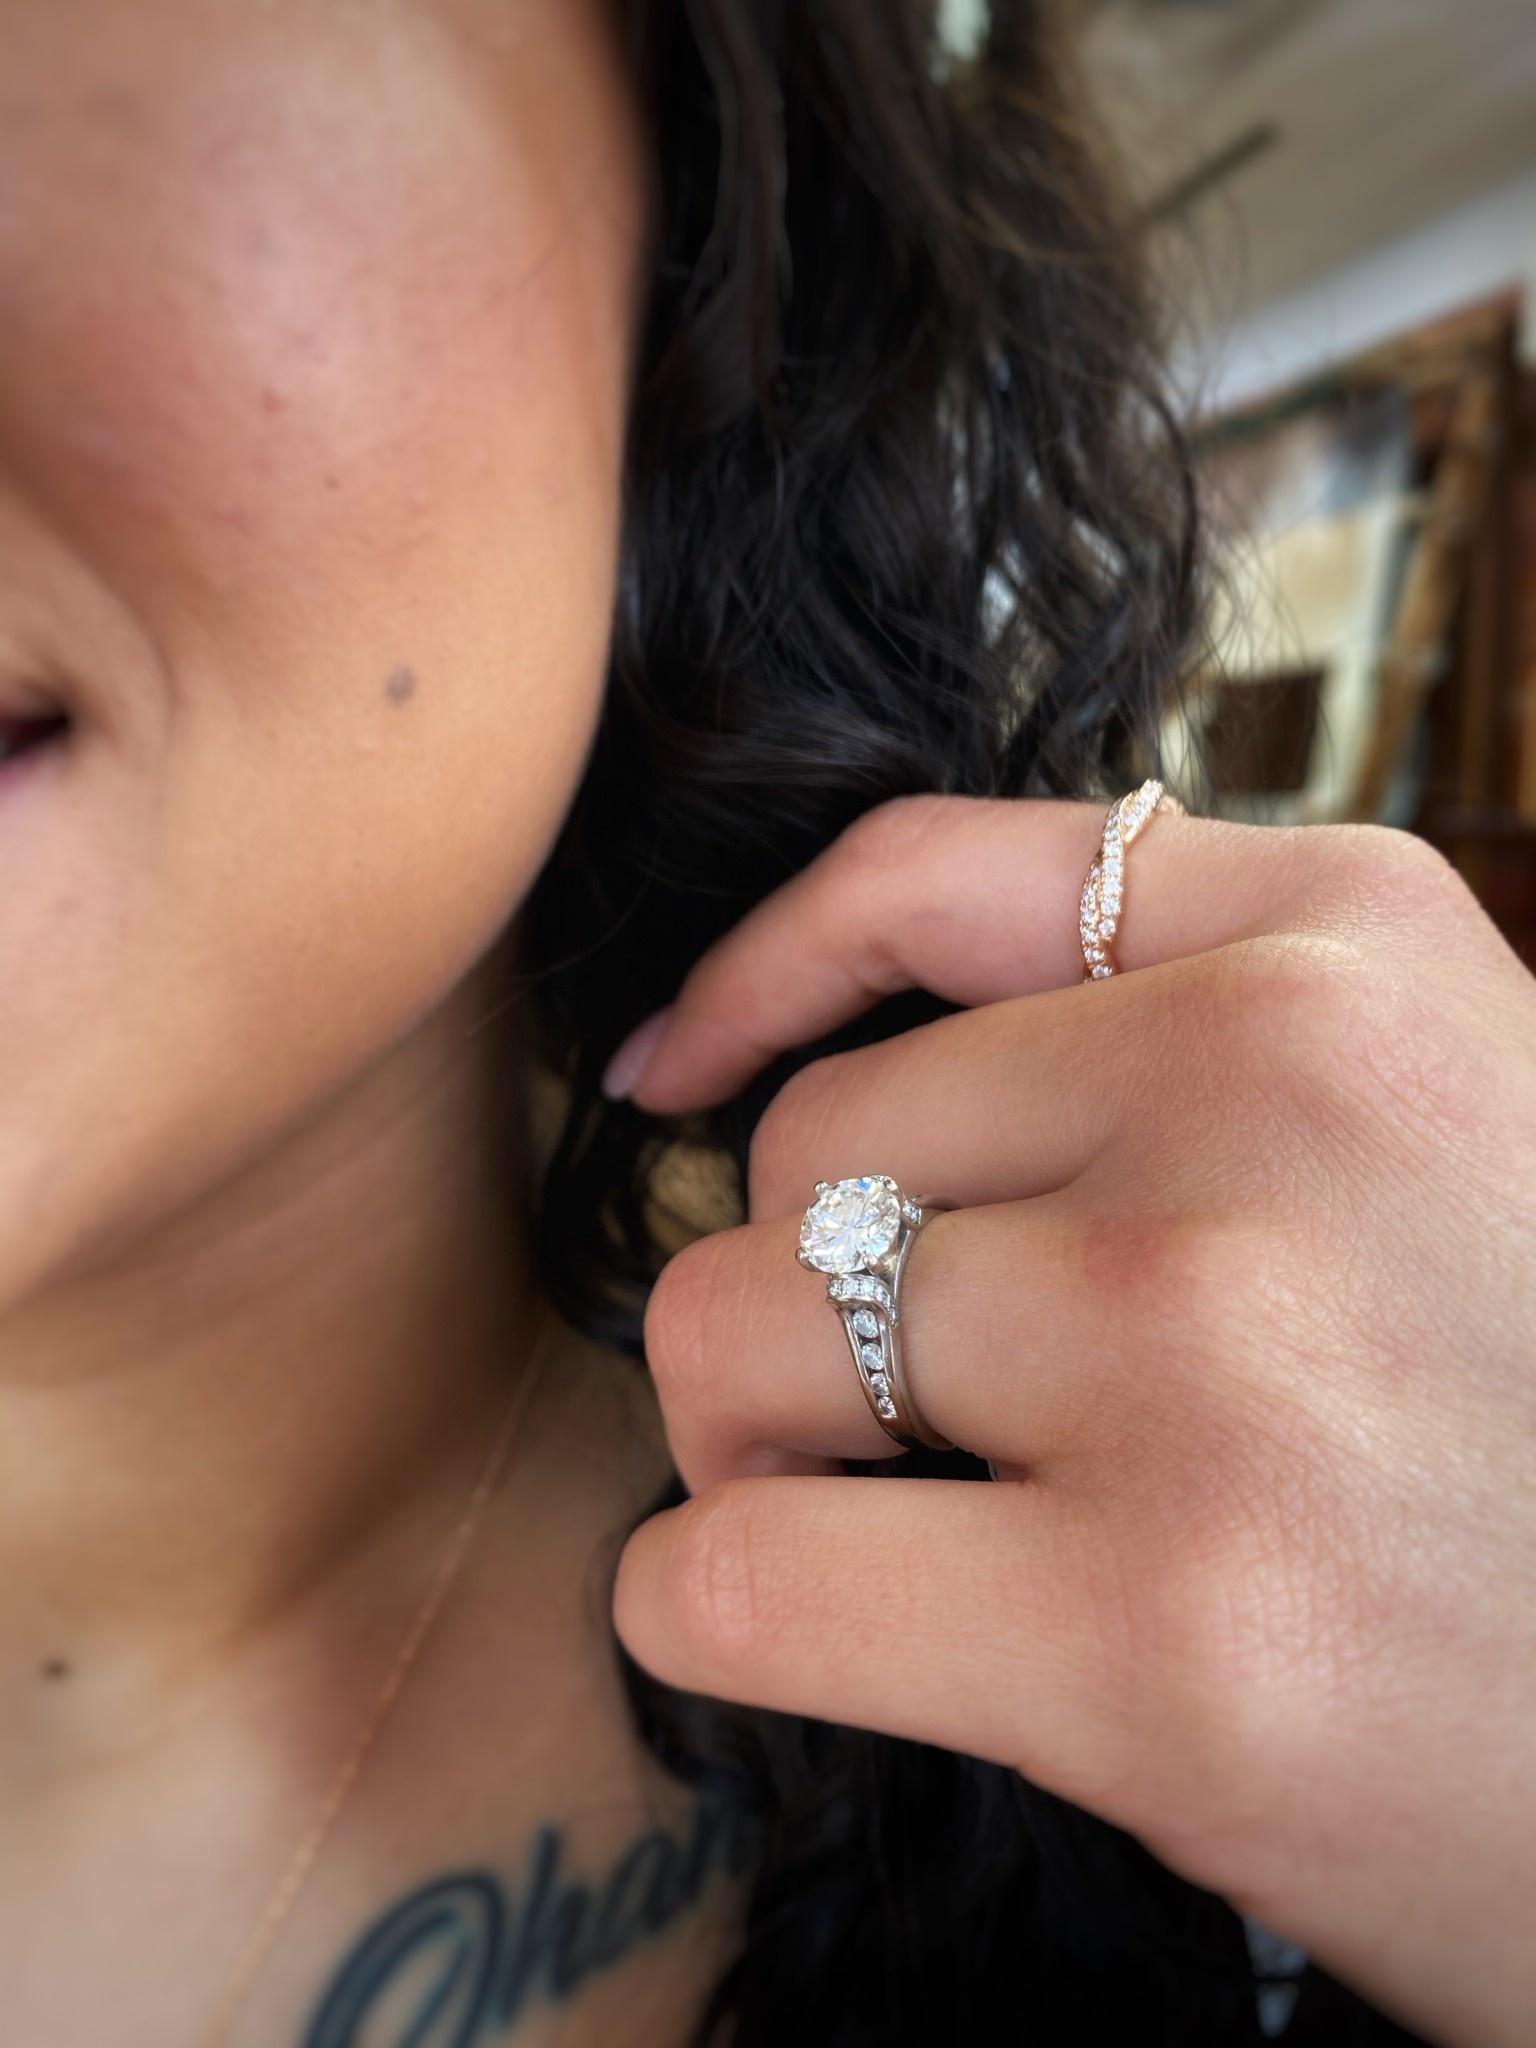 14K White Gold 1.53ct Round Diamond Melee Ring